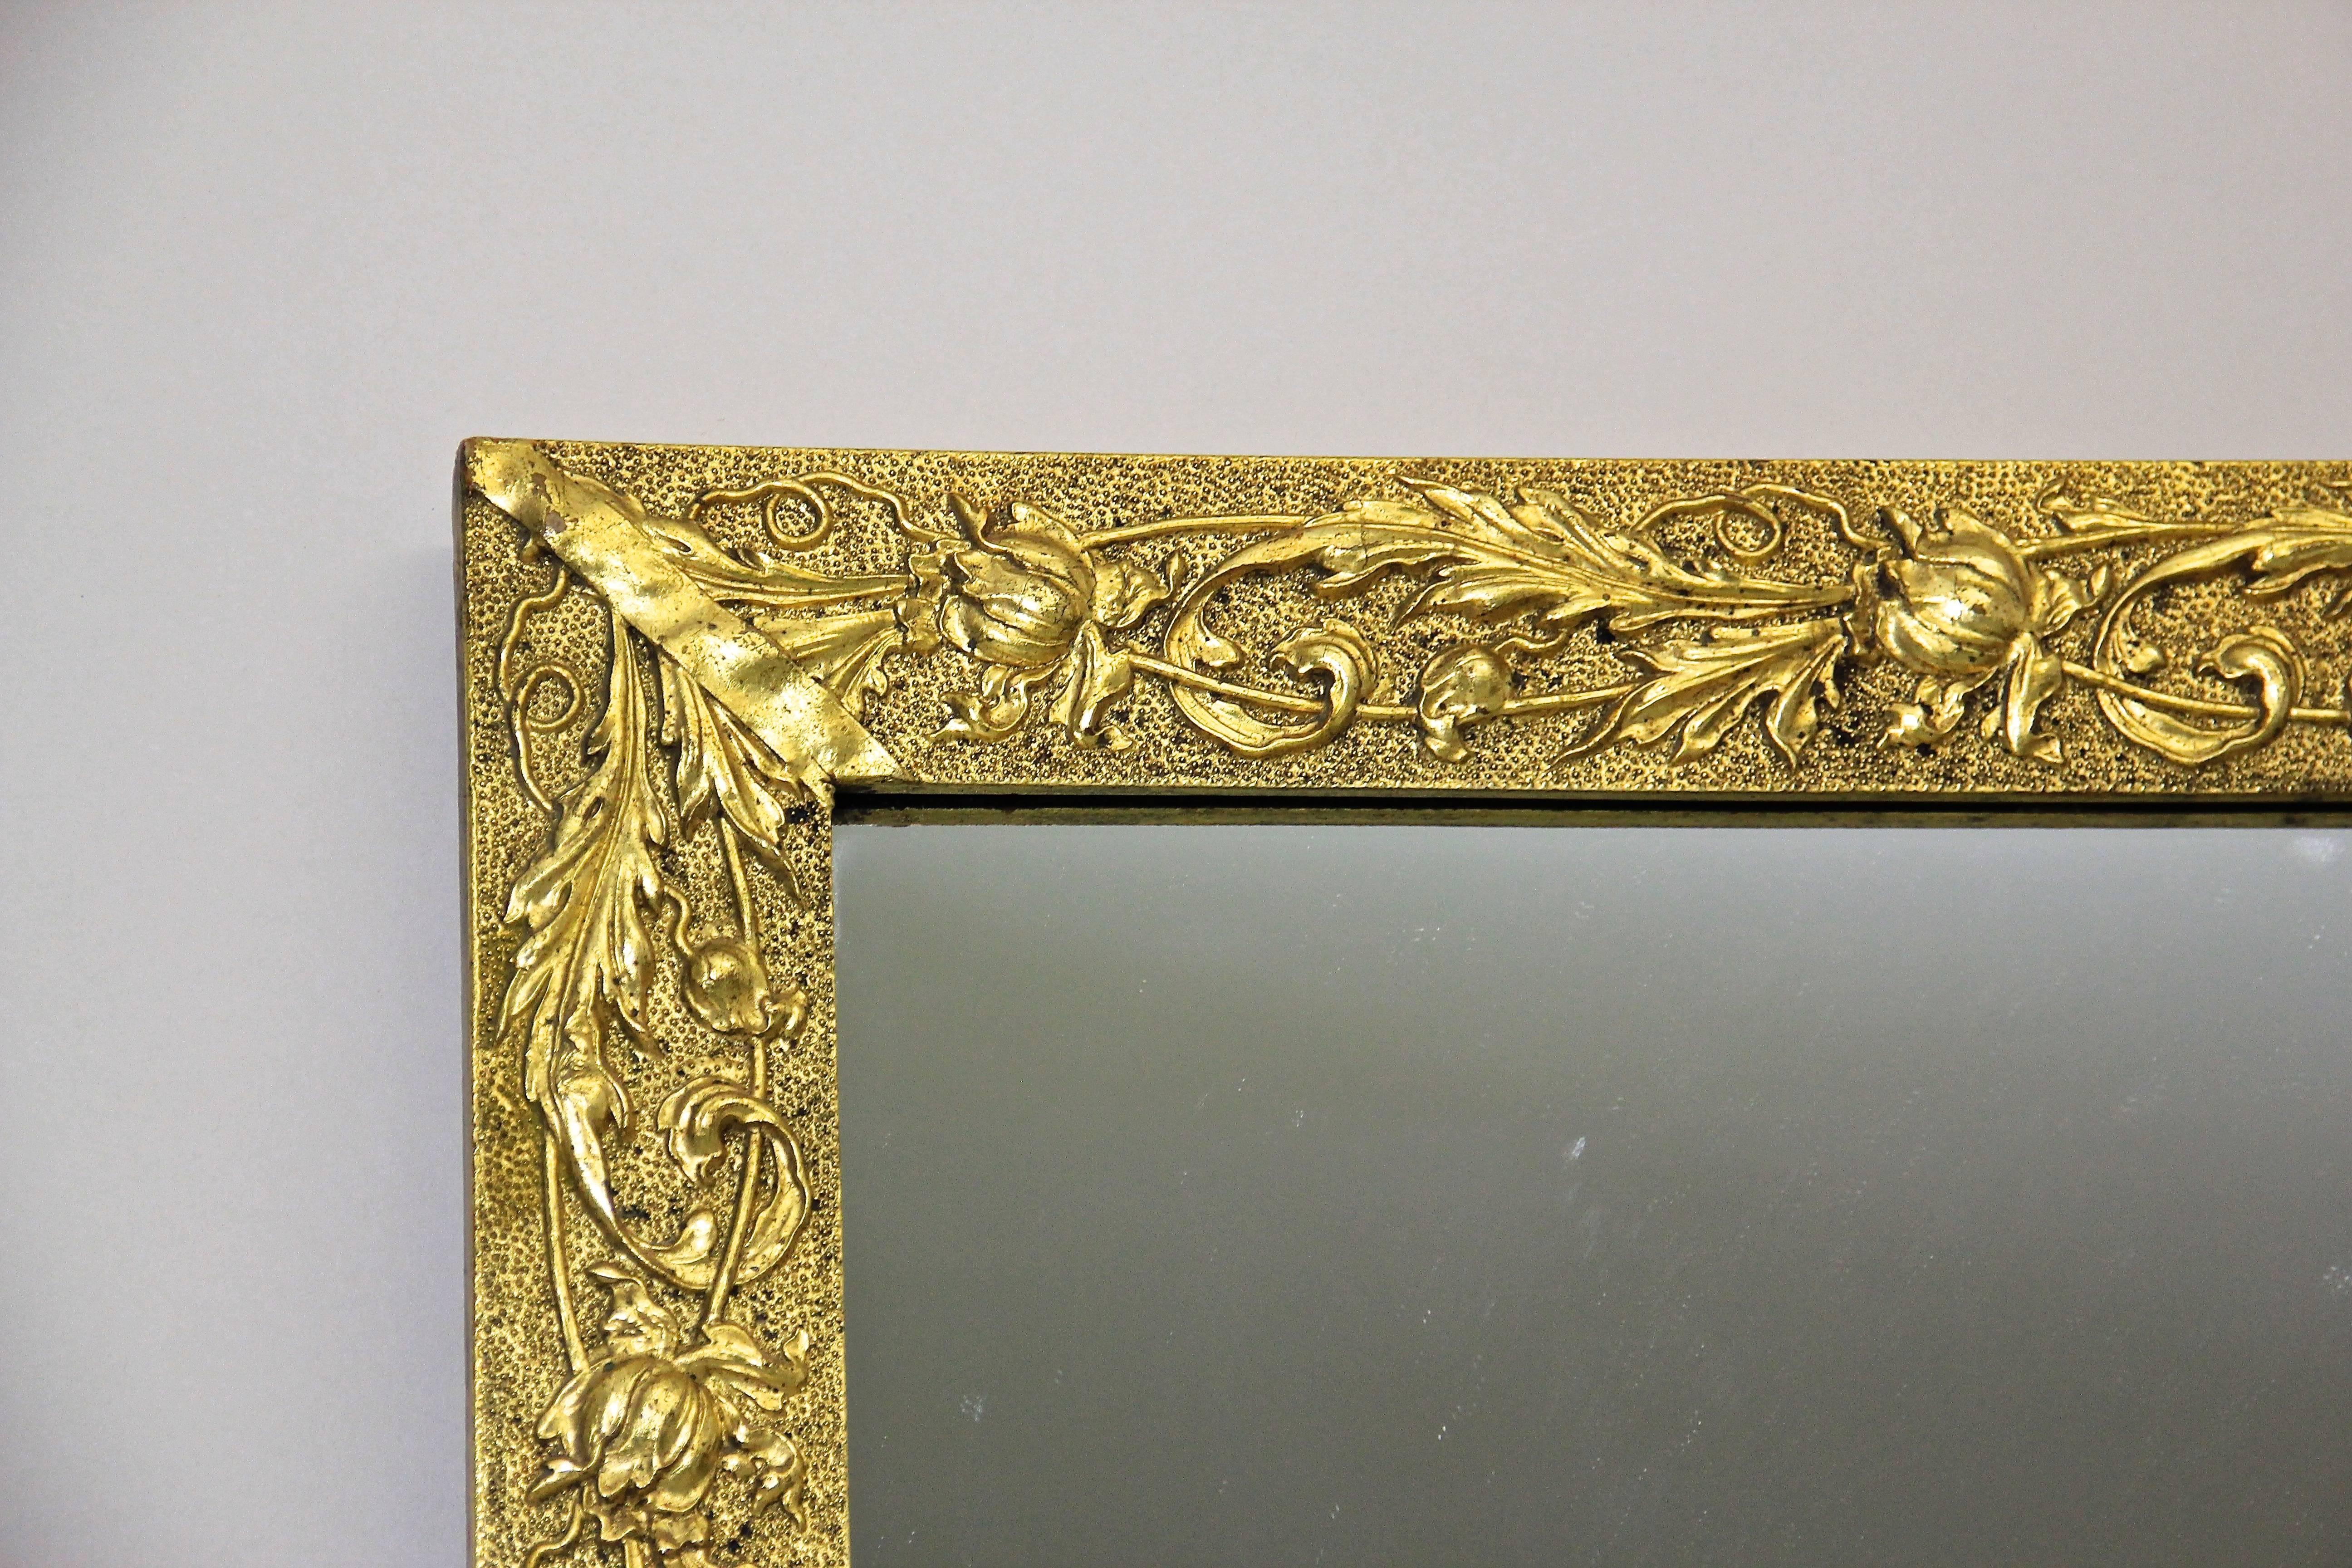 Golden Art Nouveau Mirror, Austria circa 1910 For Sale at 1stdibs